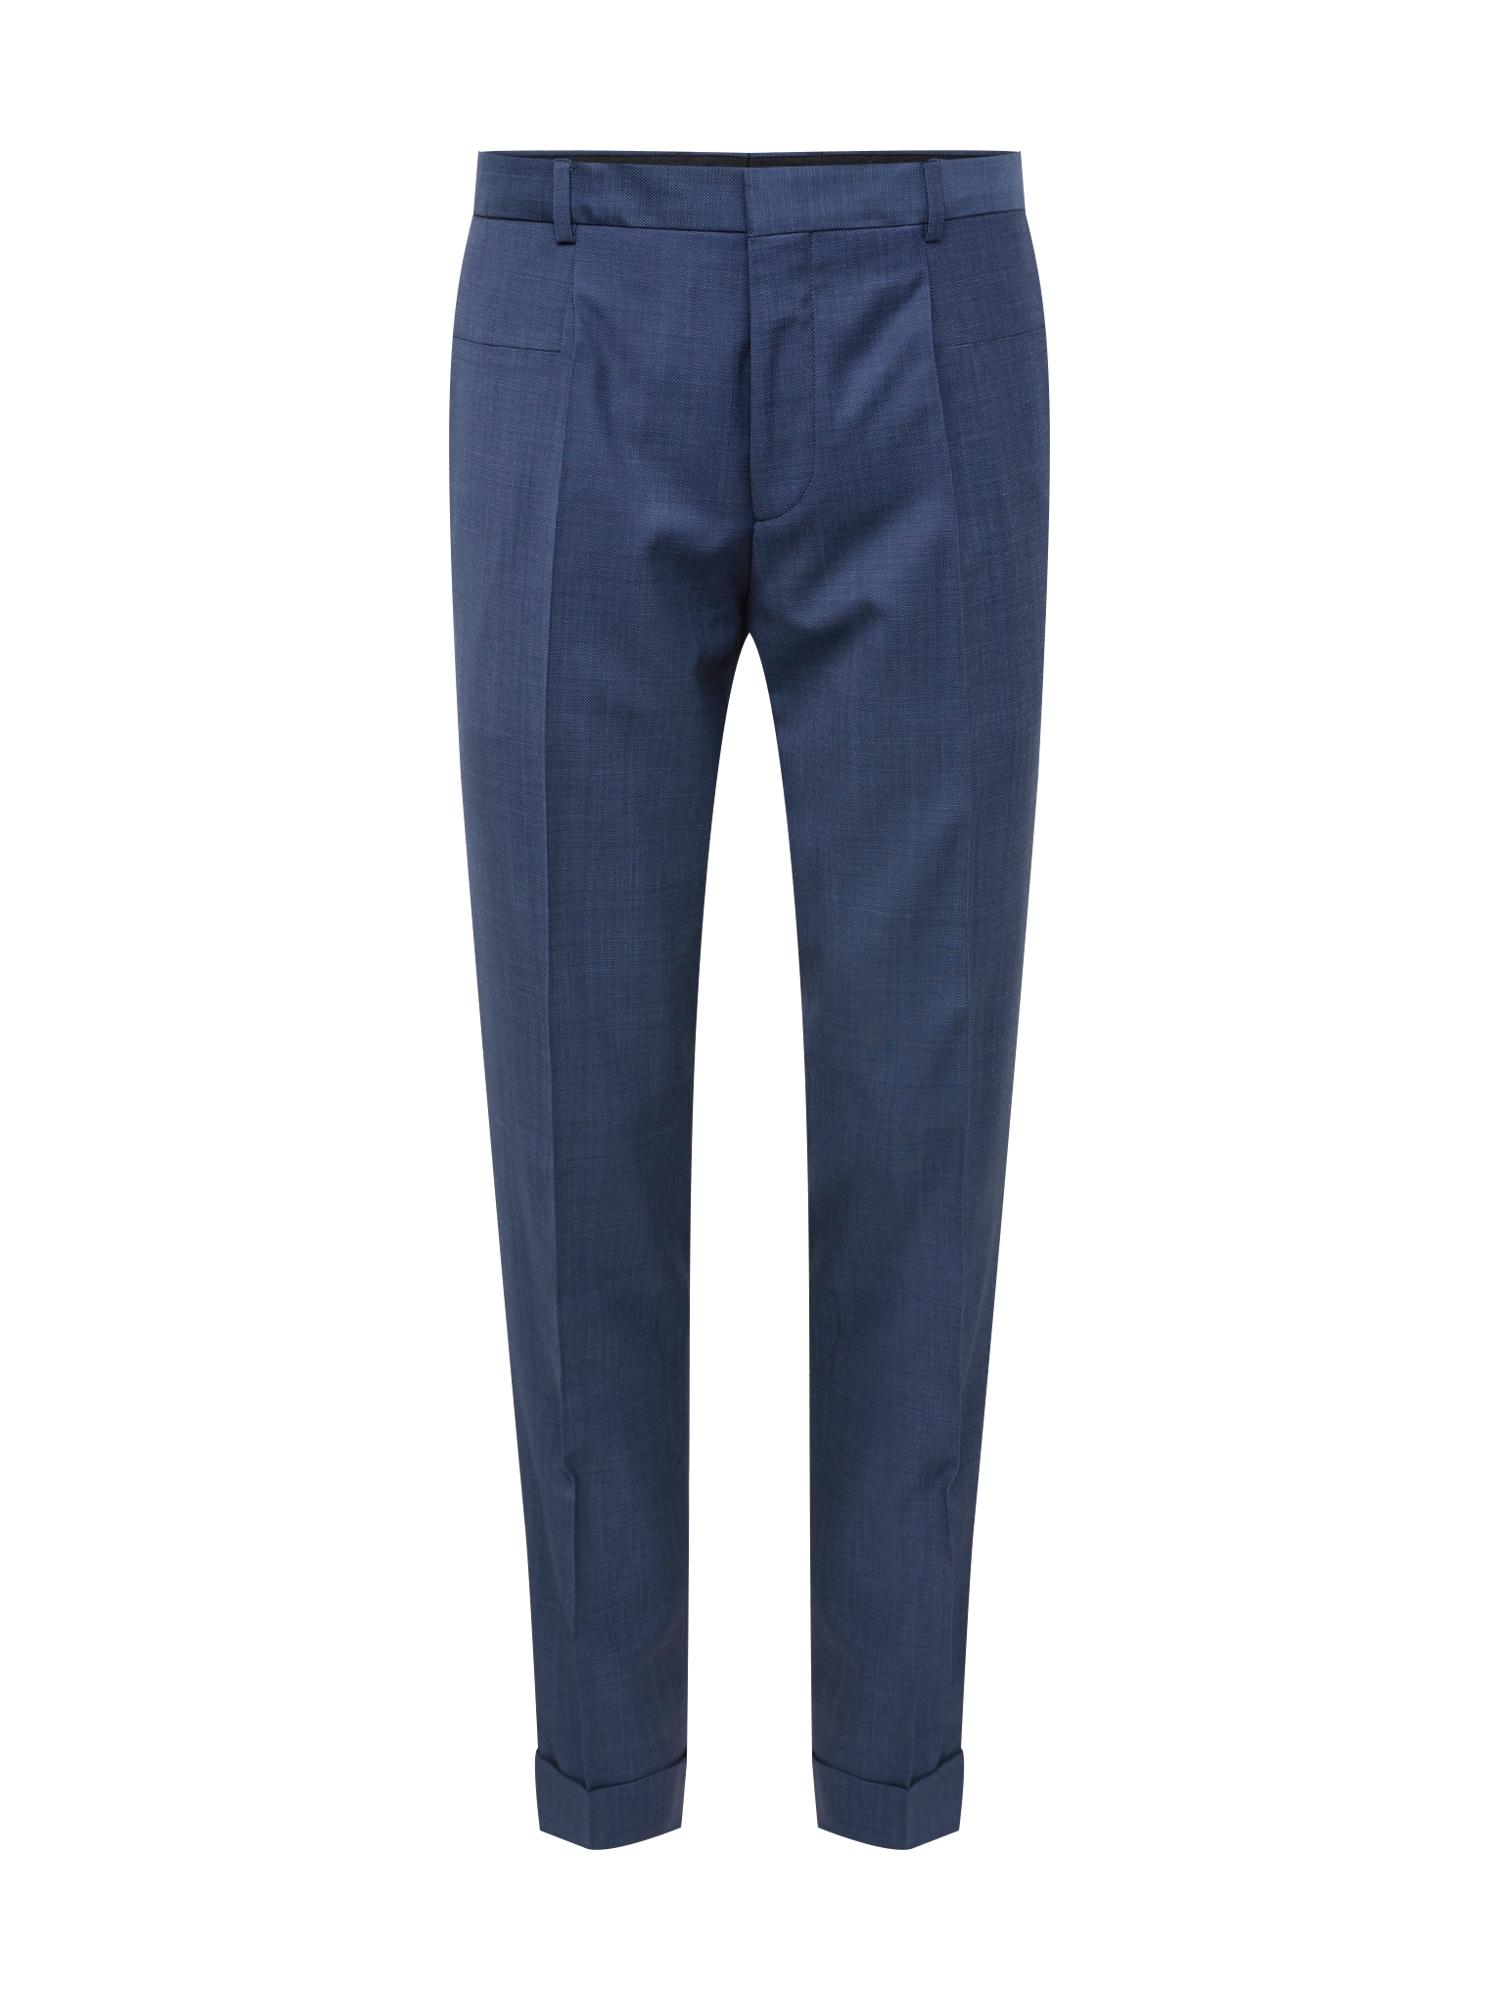 Kalhoty s puky Gabriel193F1 tmavě modrá HUGO